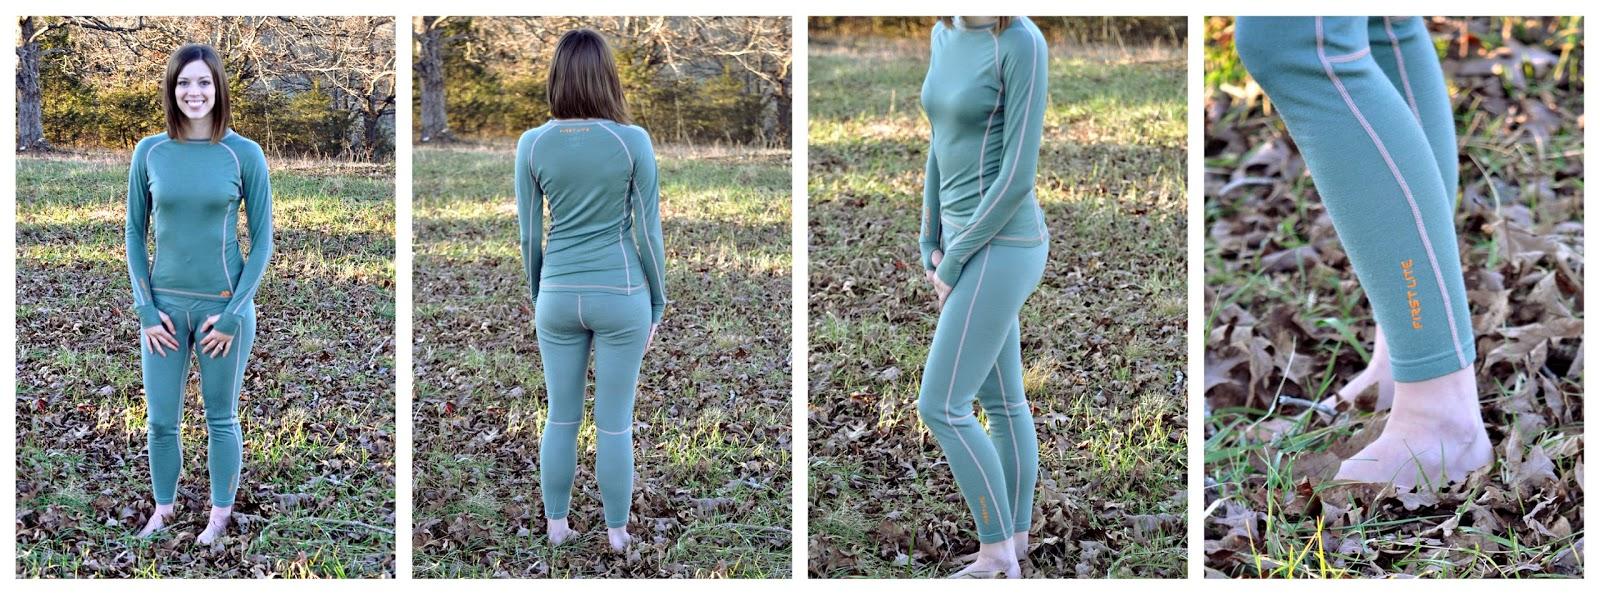 Huntress View  Women s First Lite Merino Wool Base Layers Review c773d84eb